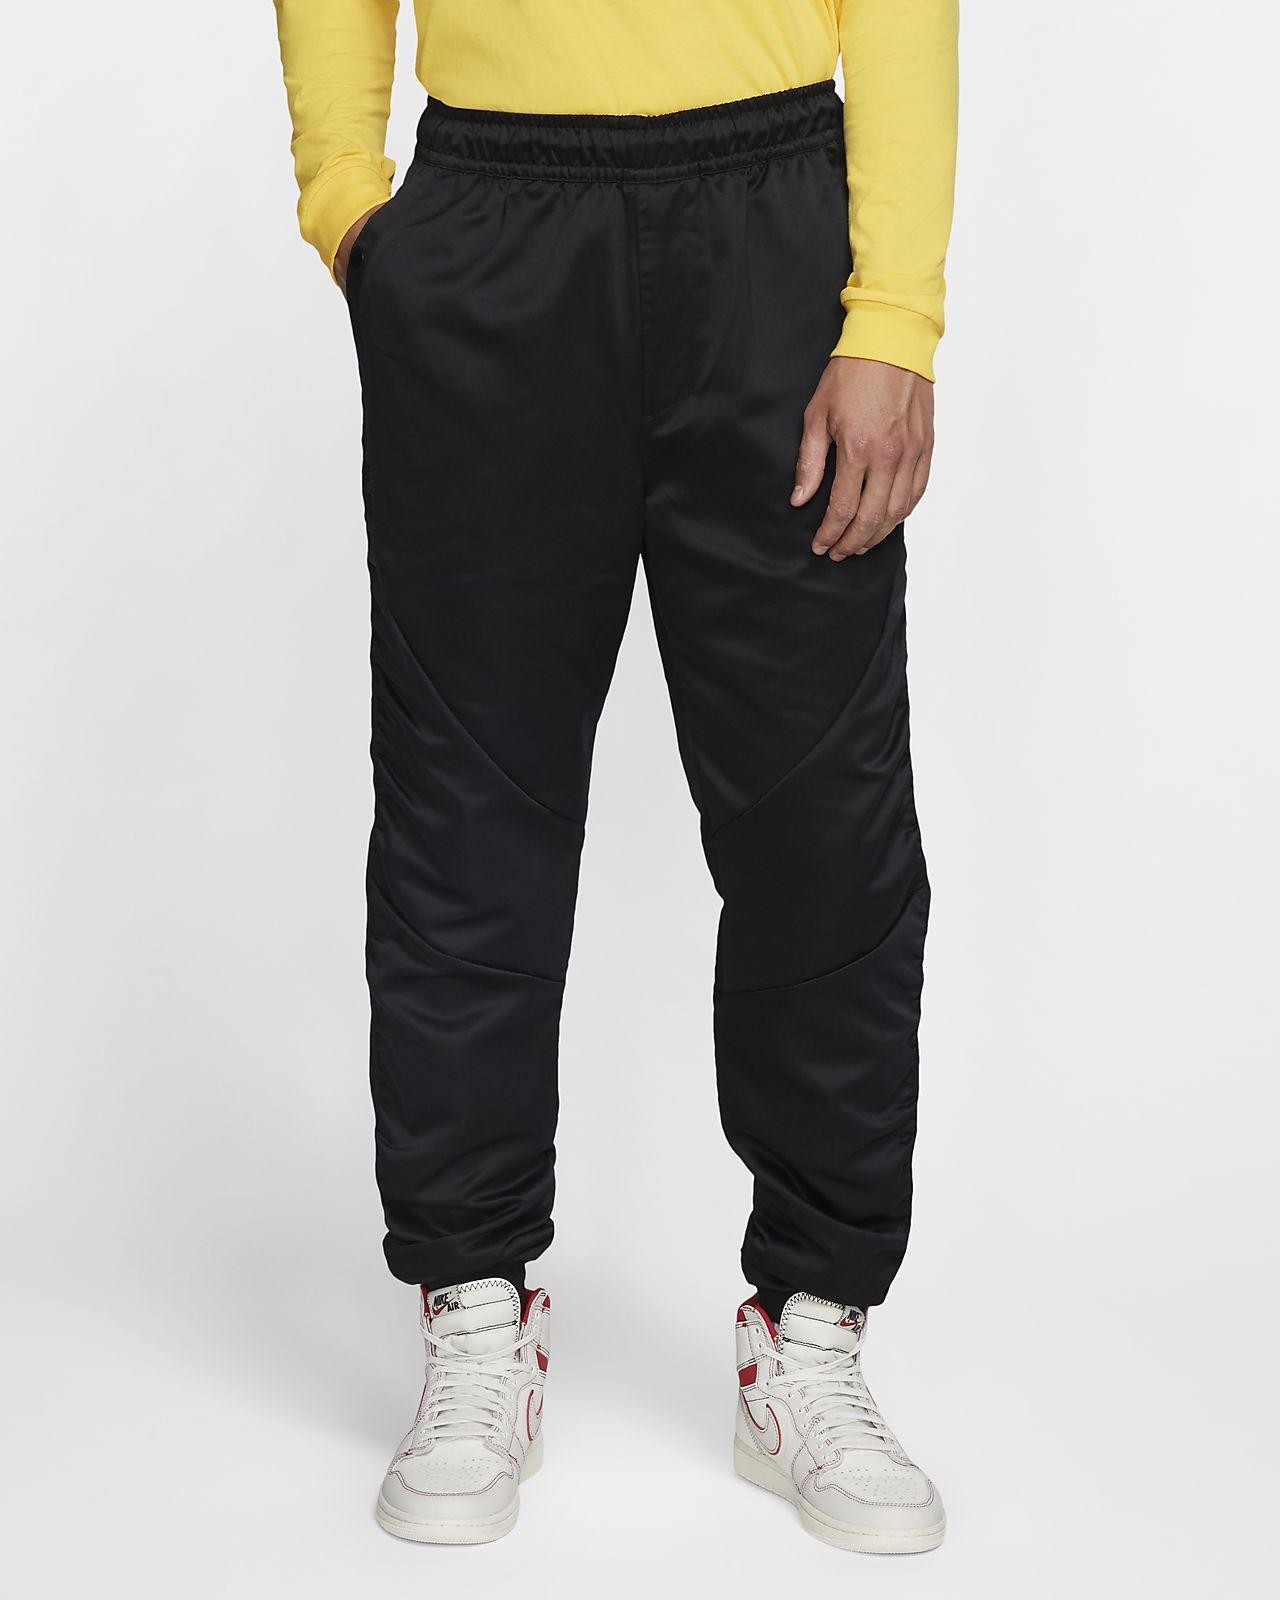 Jordan Black Cat Flight Suit-Hose für Herren